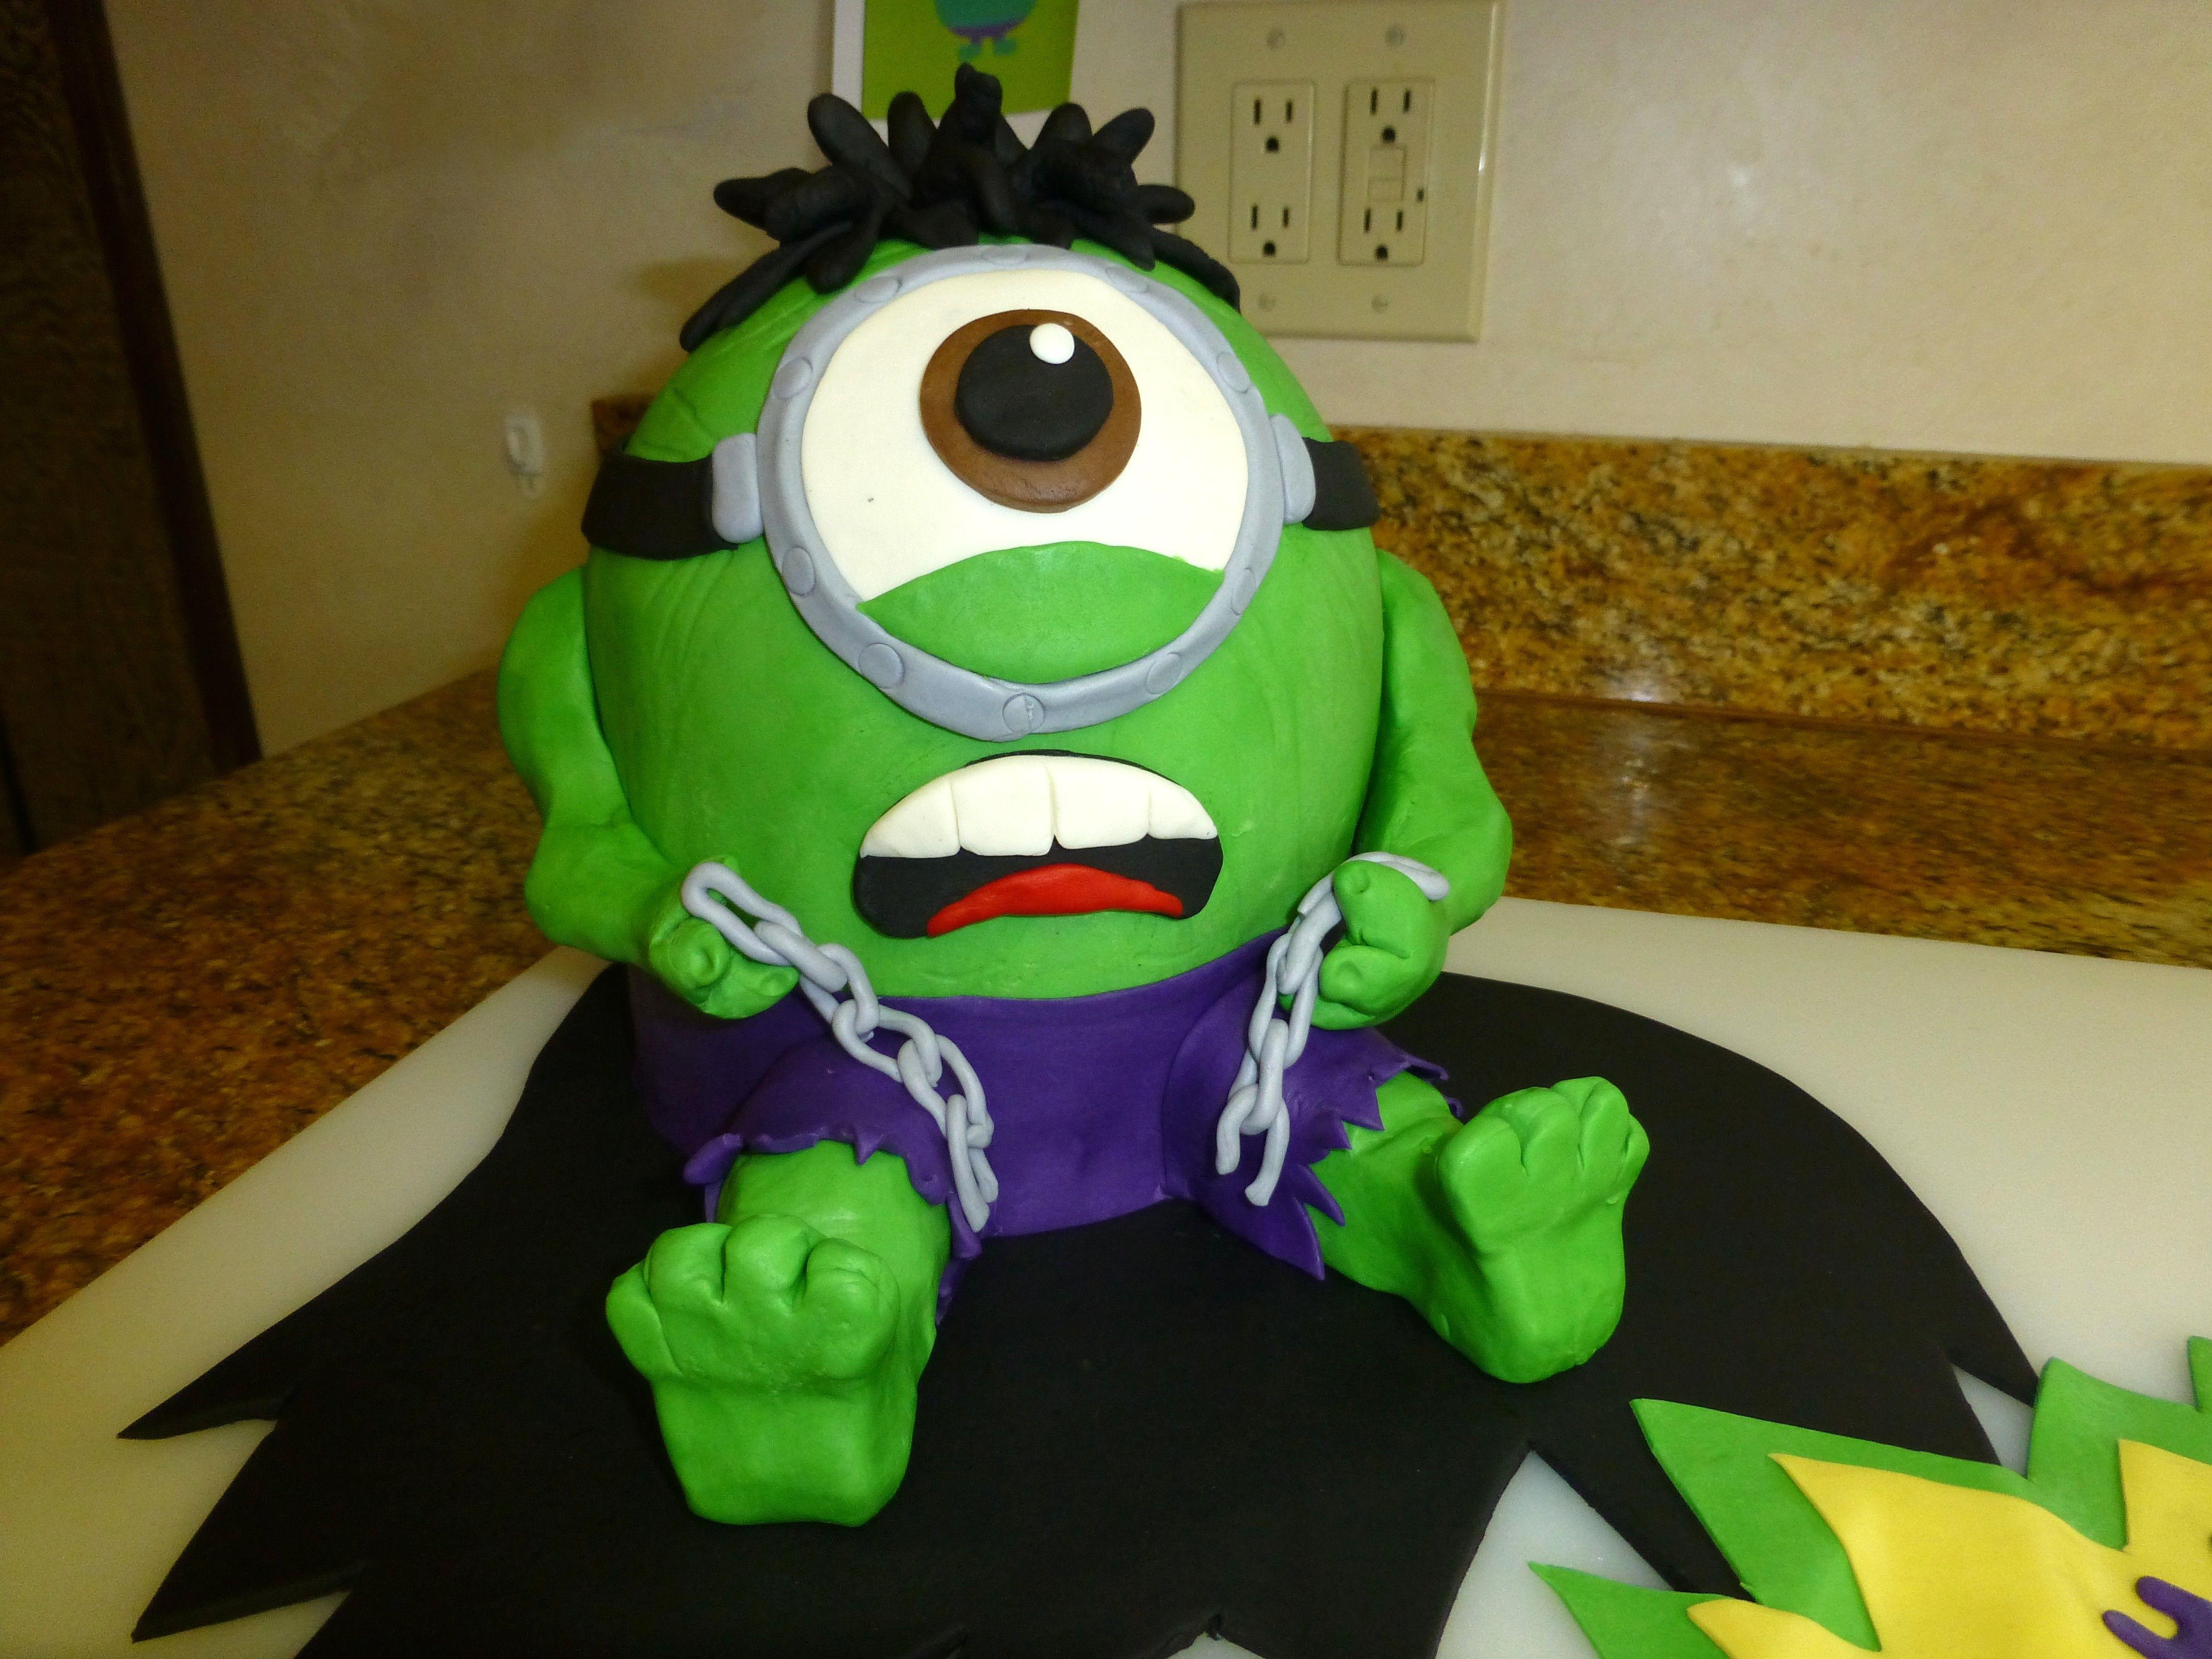 Hulk Minion PASTRY FUN Pinterest Minion cakes Cake and Cake